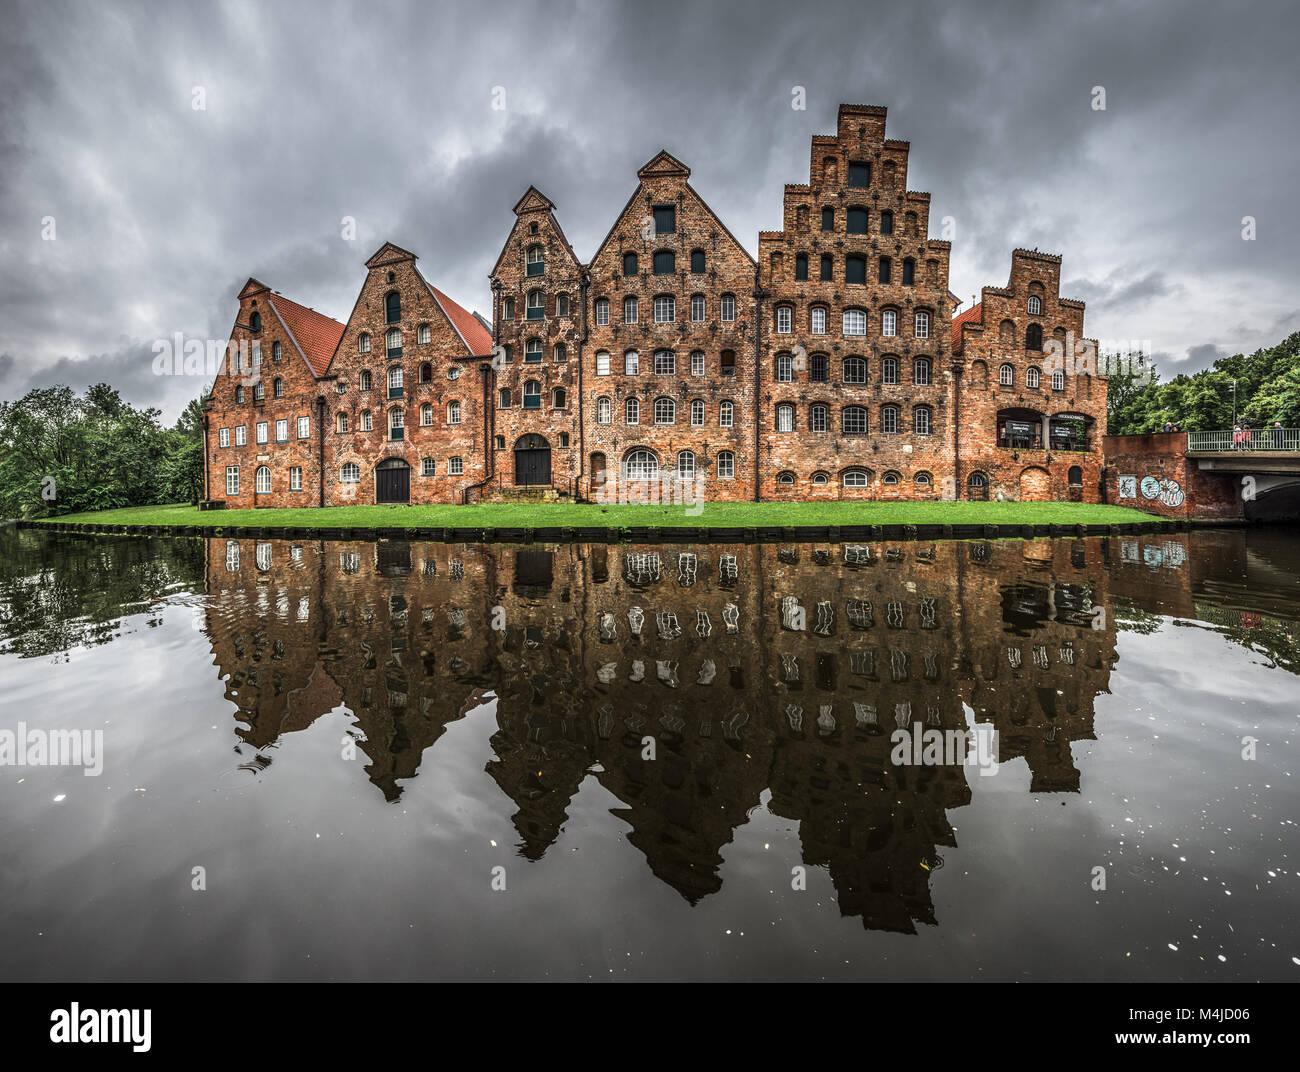 Salzspeicher, historic salt storage warehouses in Lubeck, Germany - Stock Image